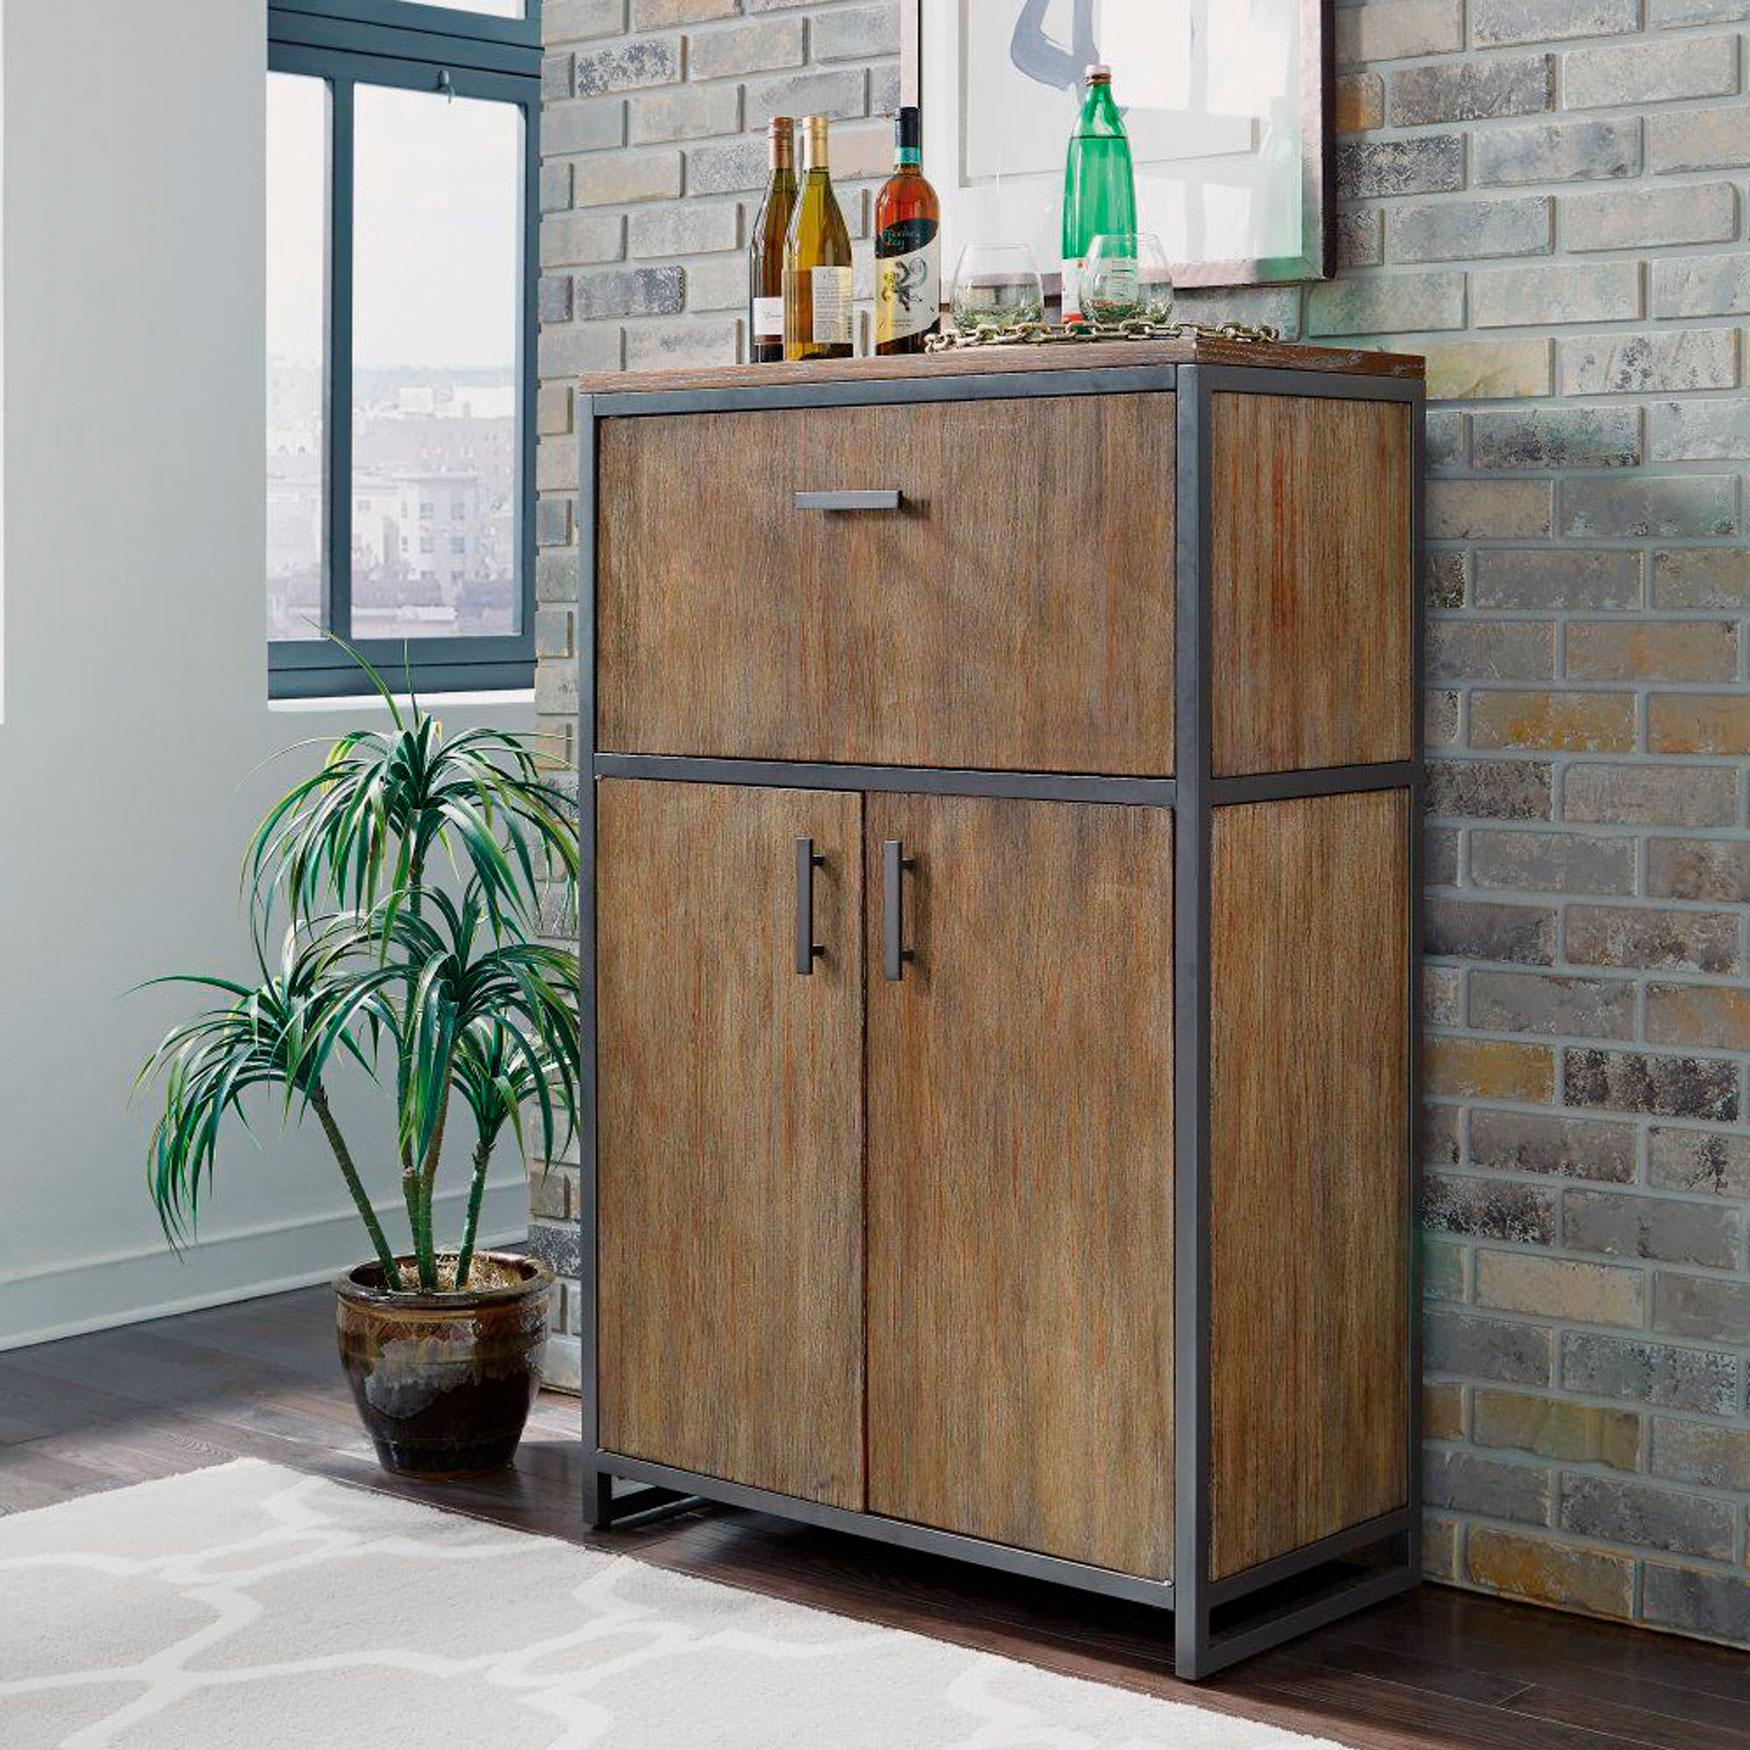 Brylane Home Kitchen: Plus Size Kitchen Carts